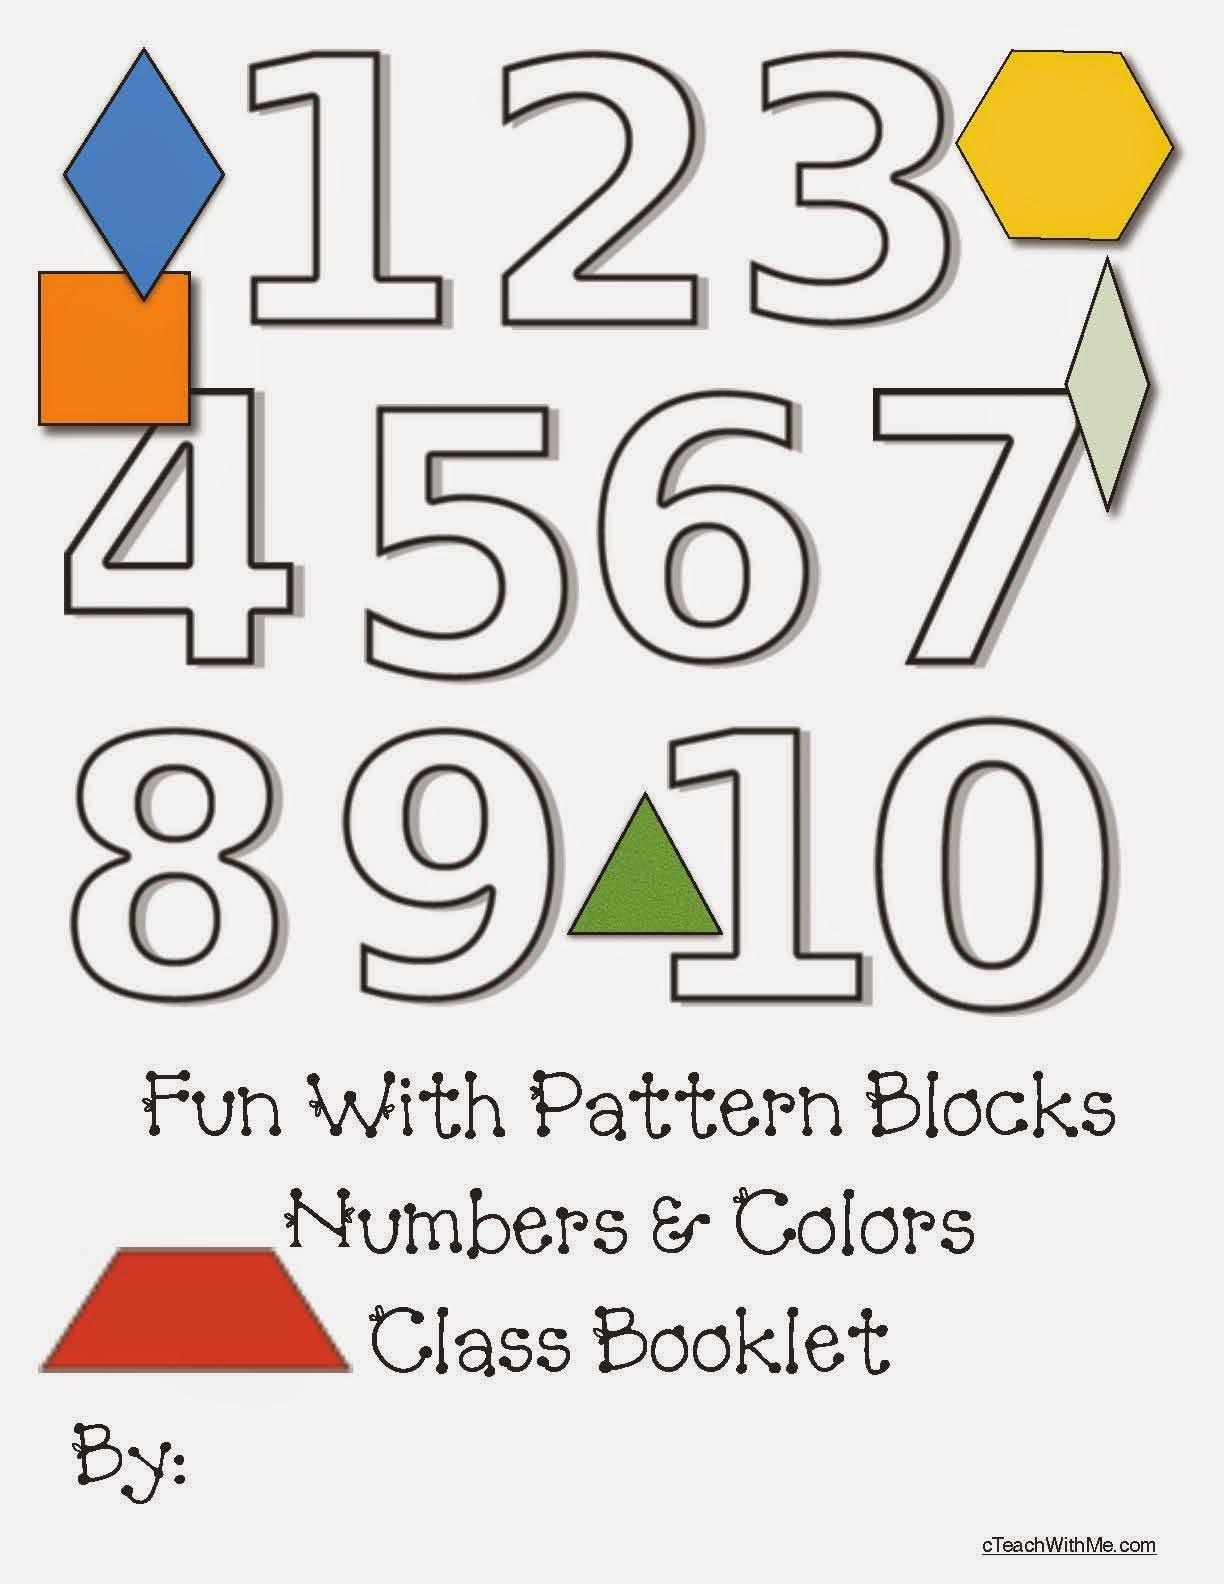 Classroom Freebies Pattern Block Number Booklet